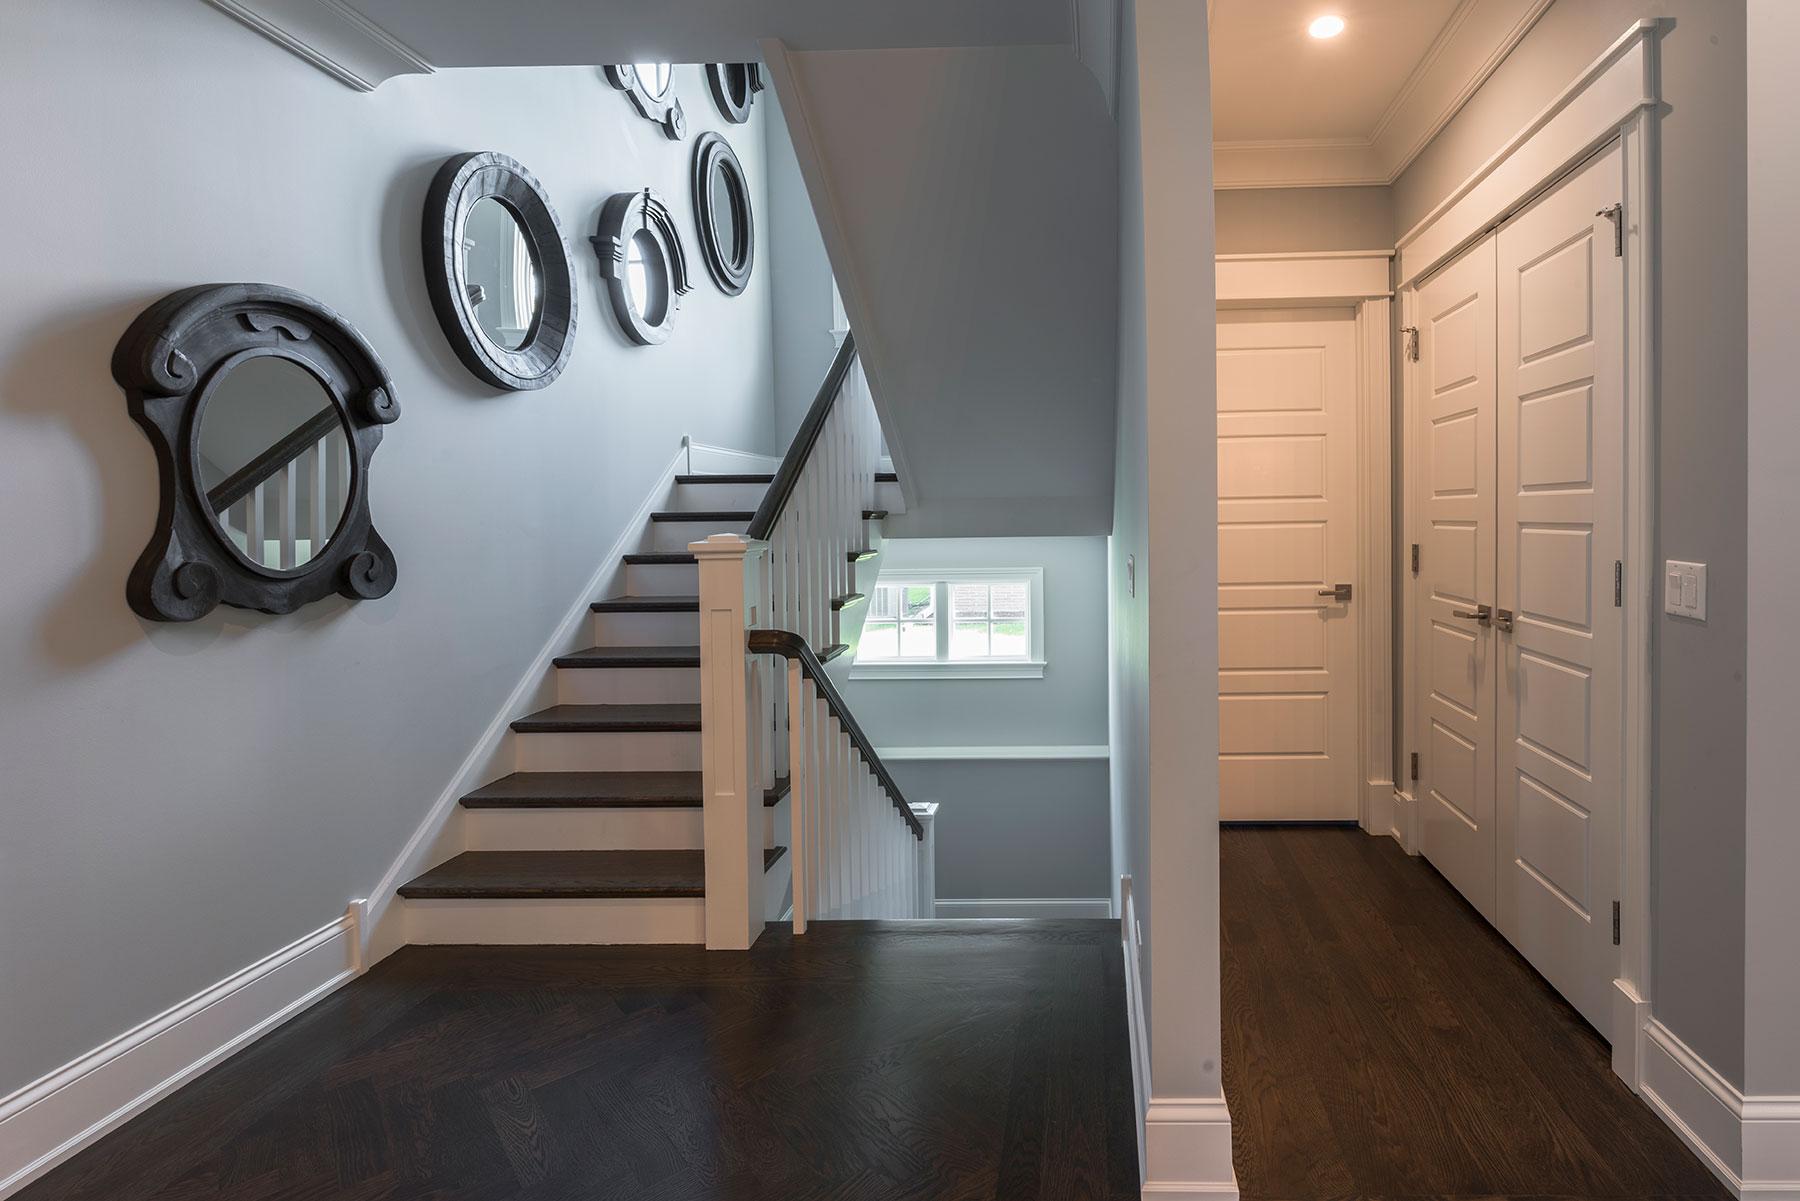 Custom Wood Interior Doors | 5 Raised Panel Paint Grade MDF Doors on Closet and Powder Room  - Glenview Doors - Custom Doors in Chicago